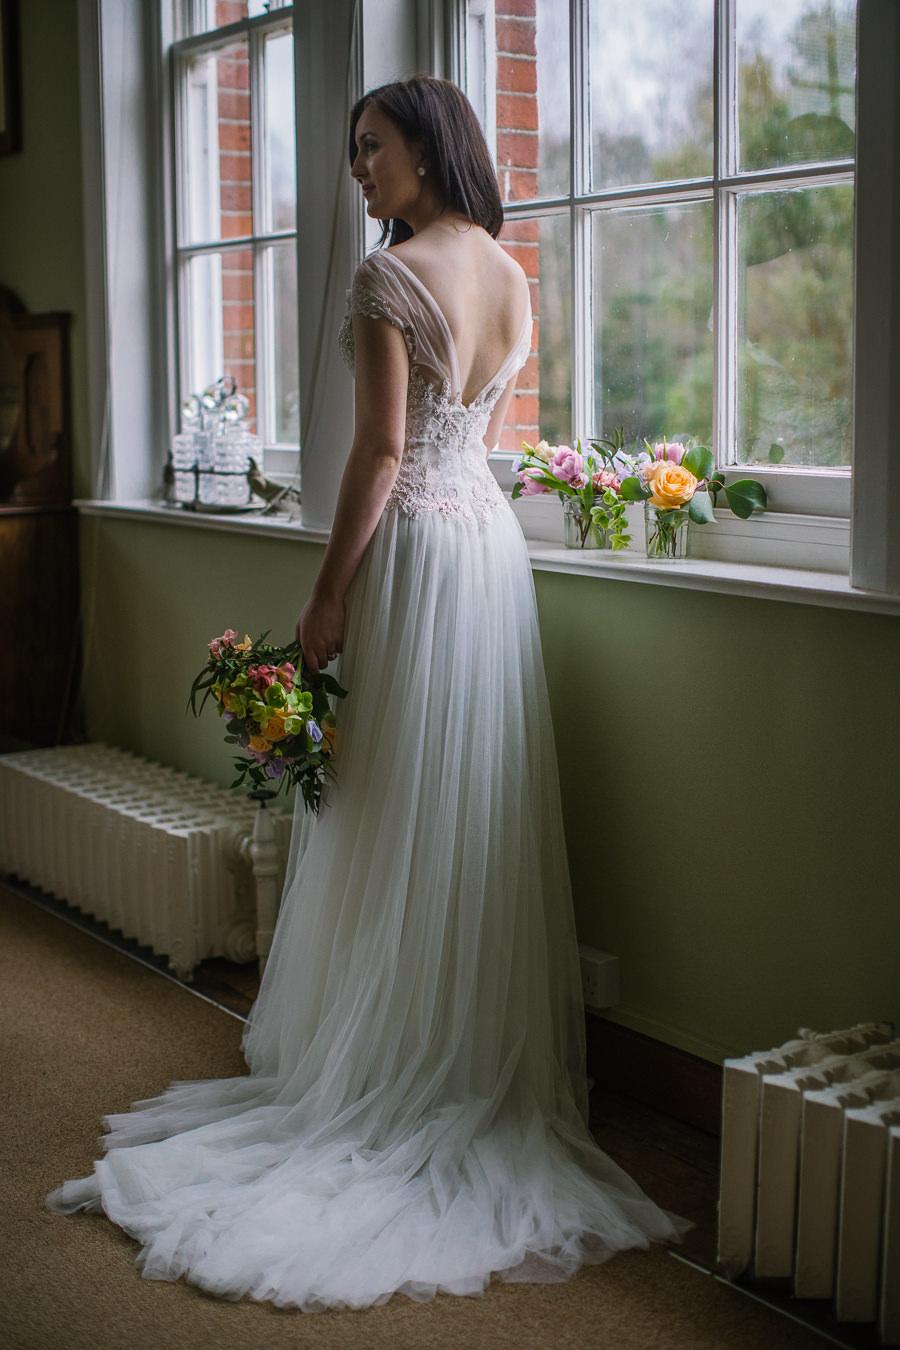 'Understated Elegance' Spring Styled Hampshire Bridal Shoot – Rownhams House, photo credit Nisha Haq Photography (8)